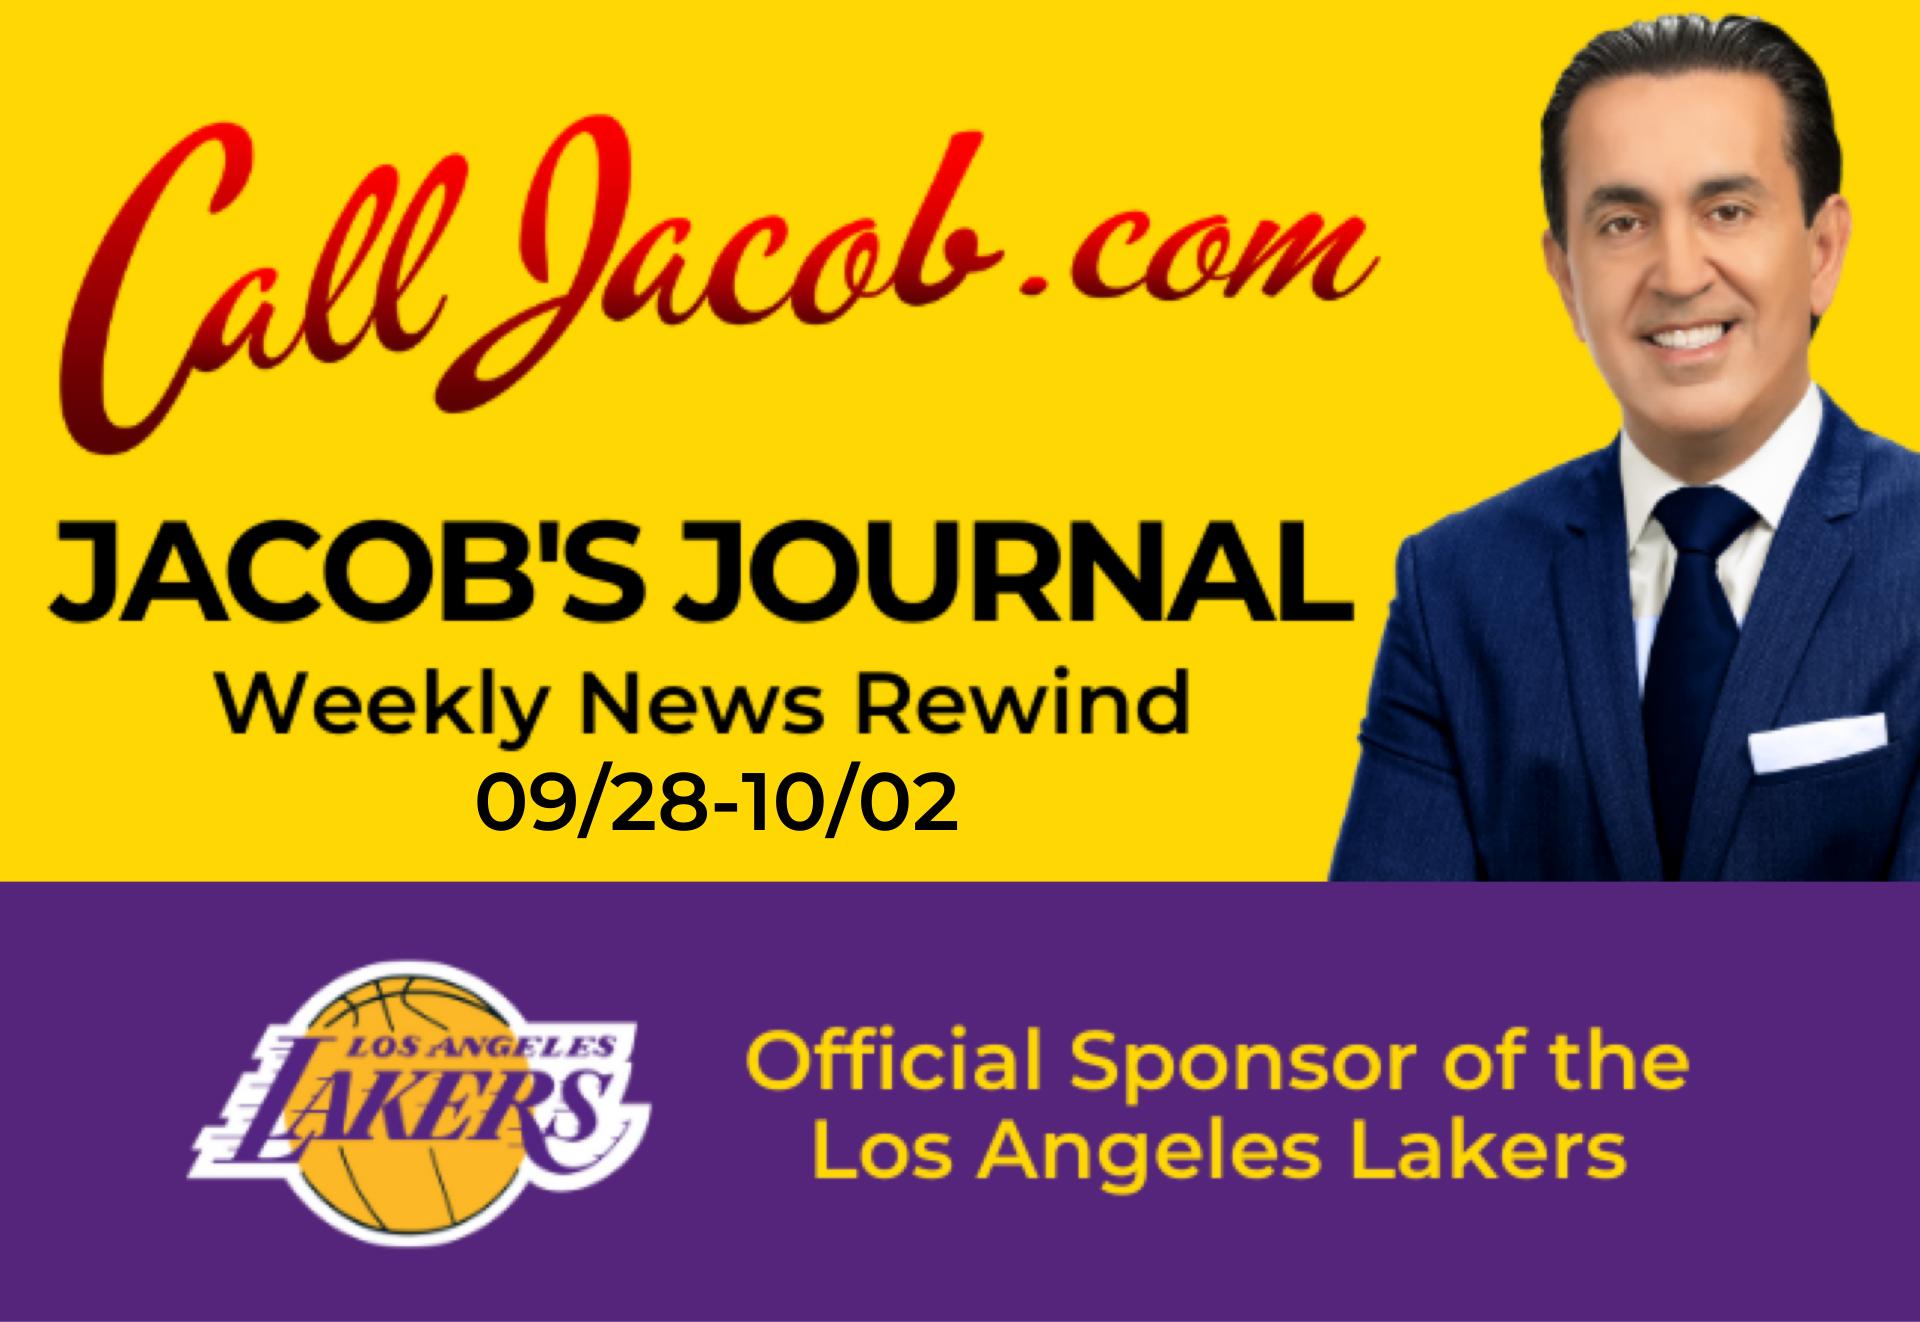 JacobsJournalWeeklyNewsRewind-09-28_10-02